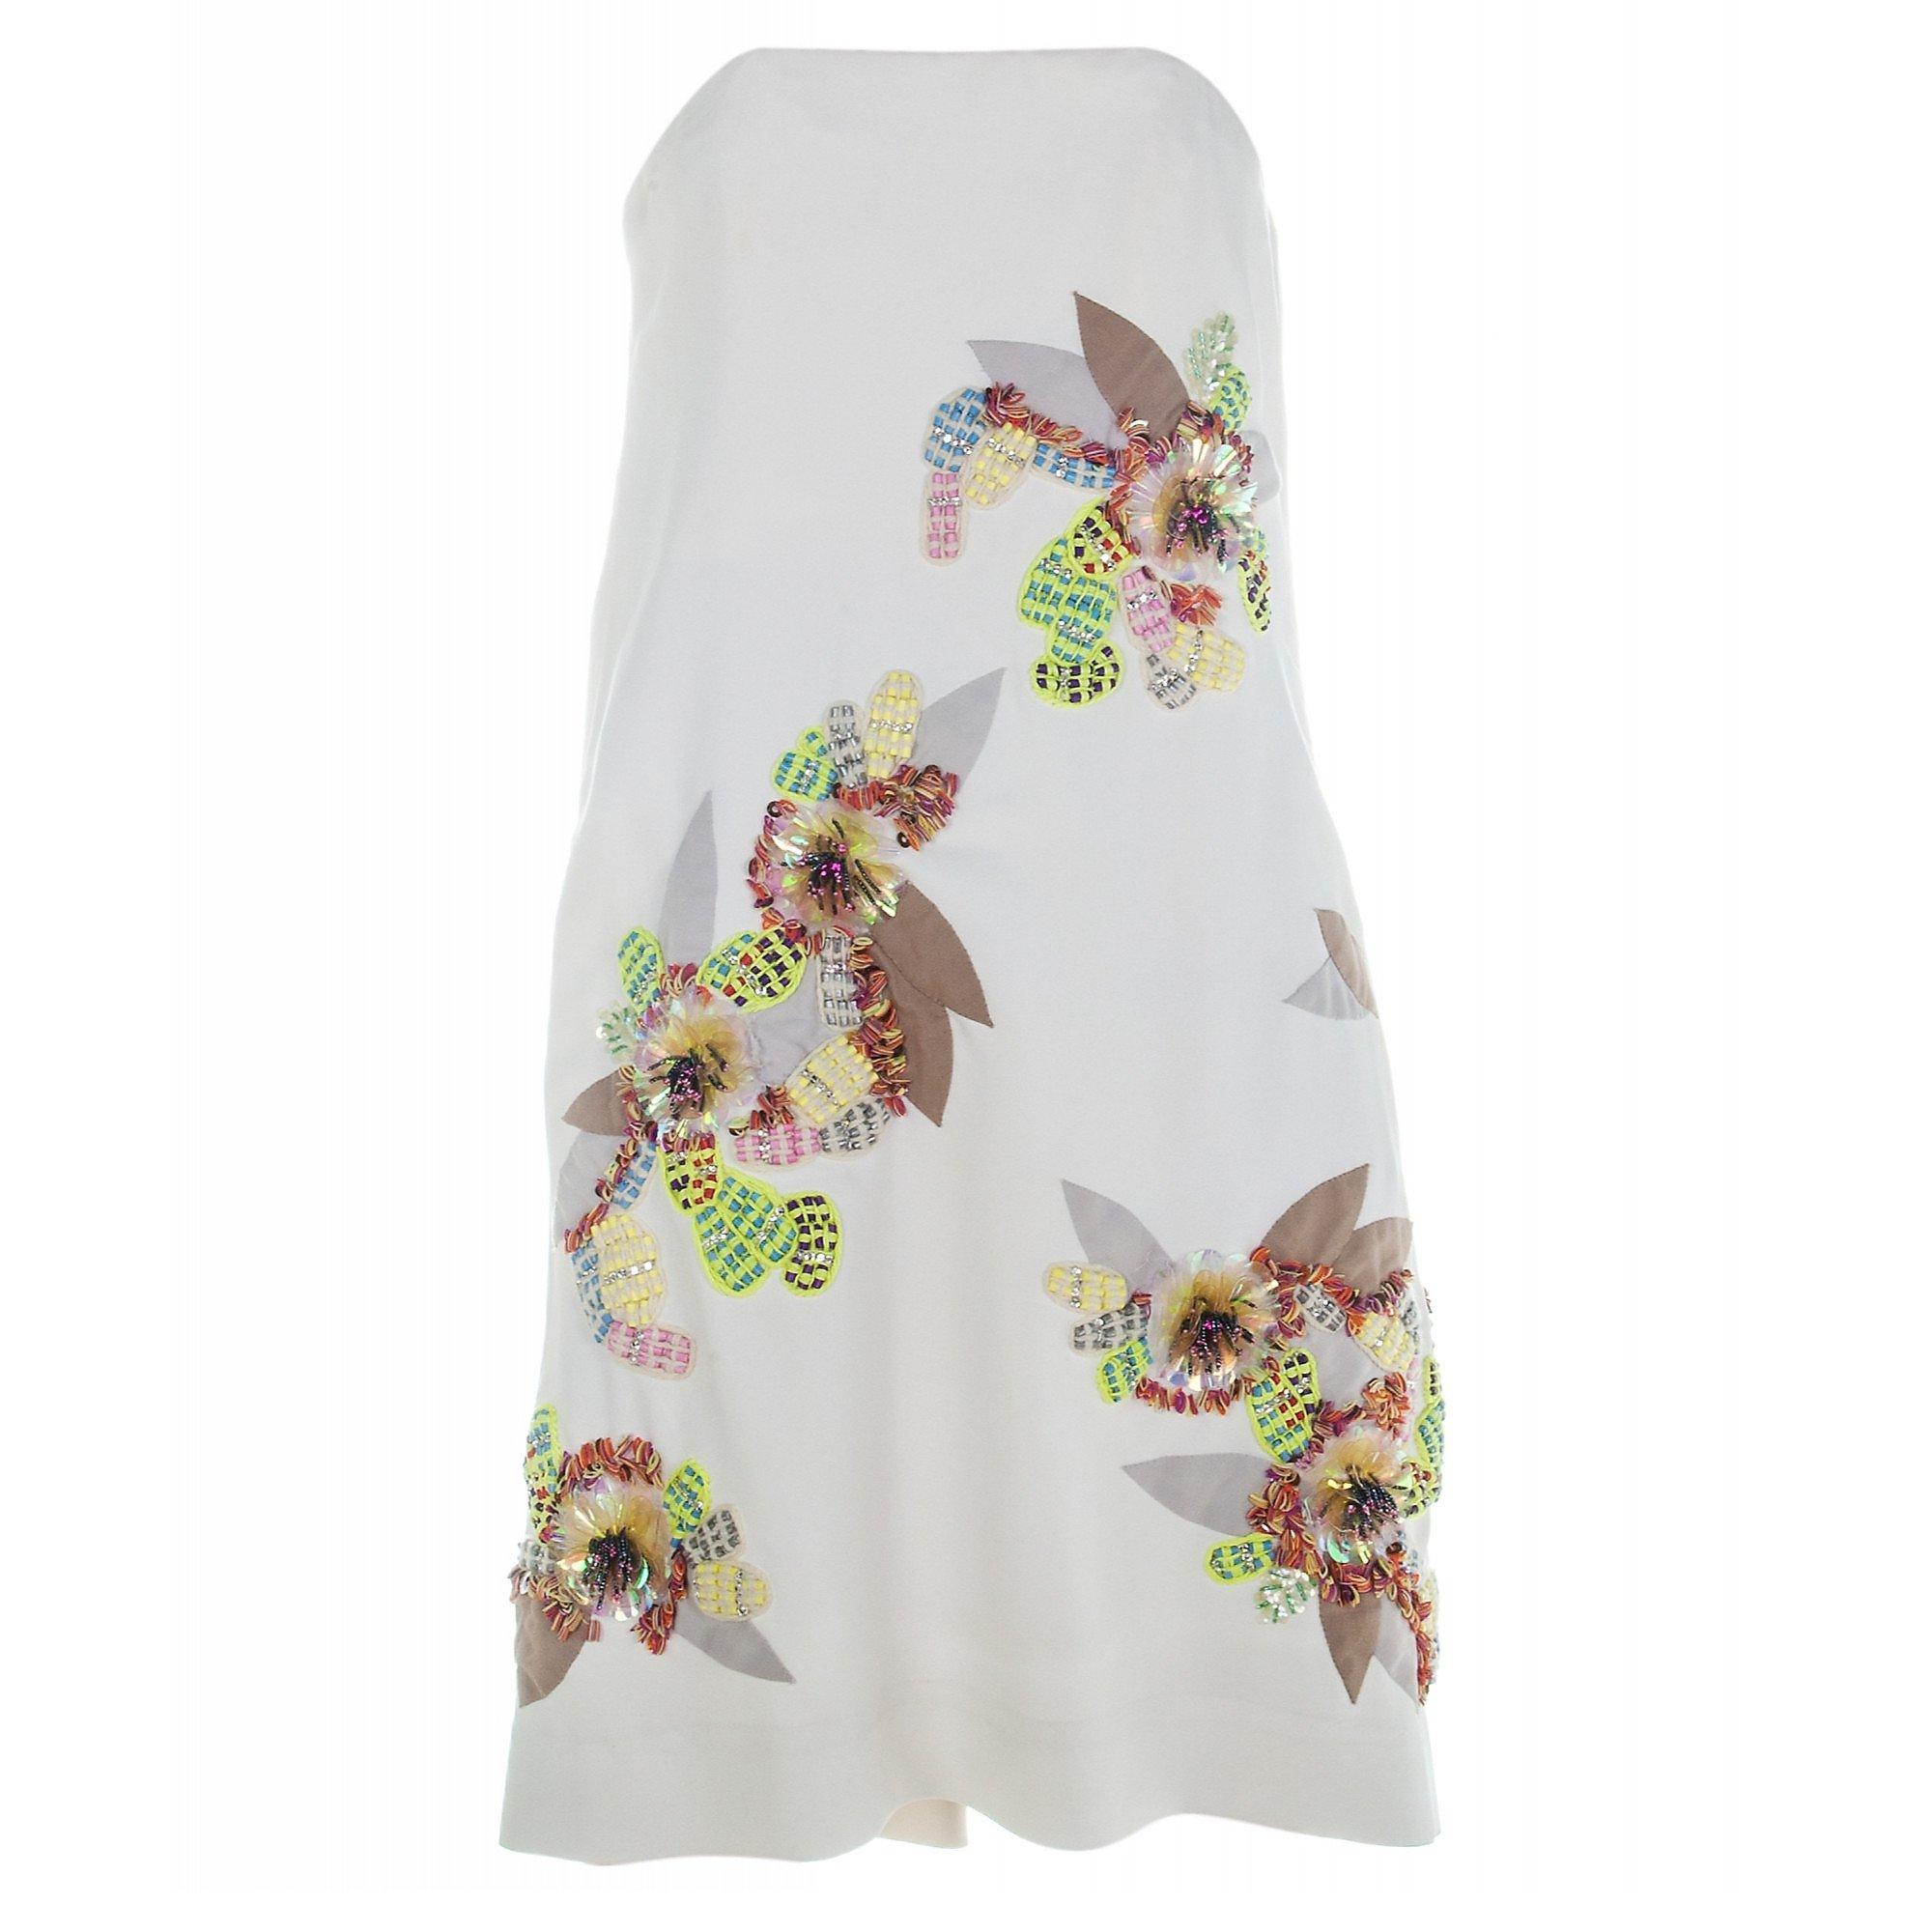 Chloé Embroidered Silk Strapless Dress